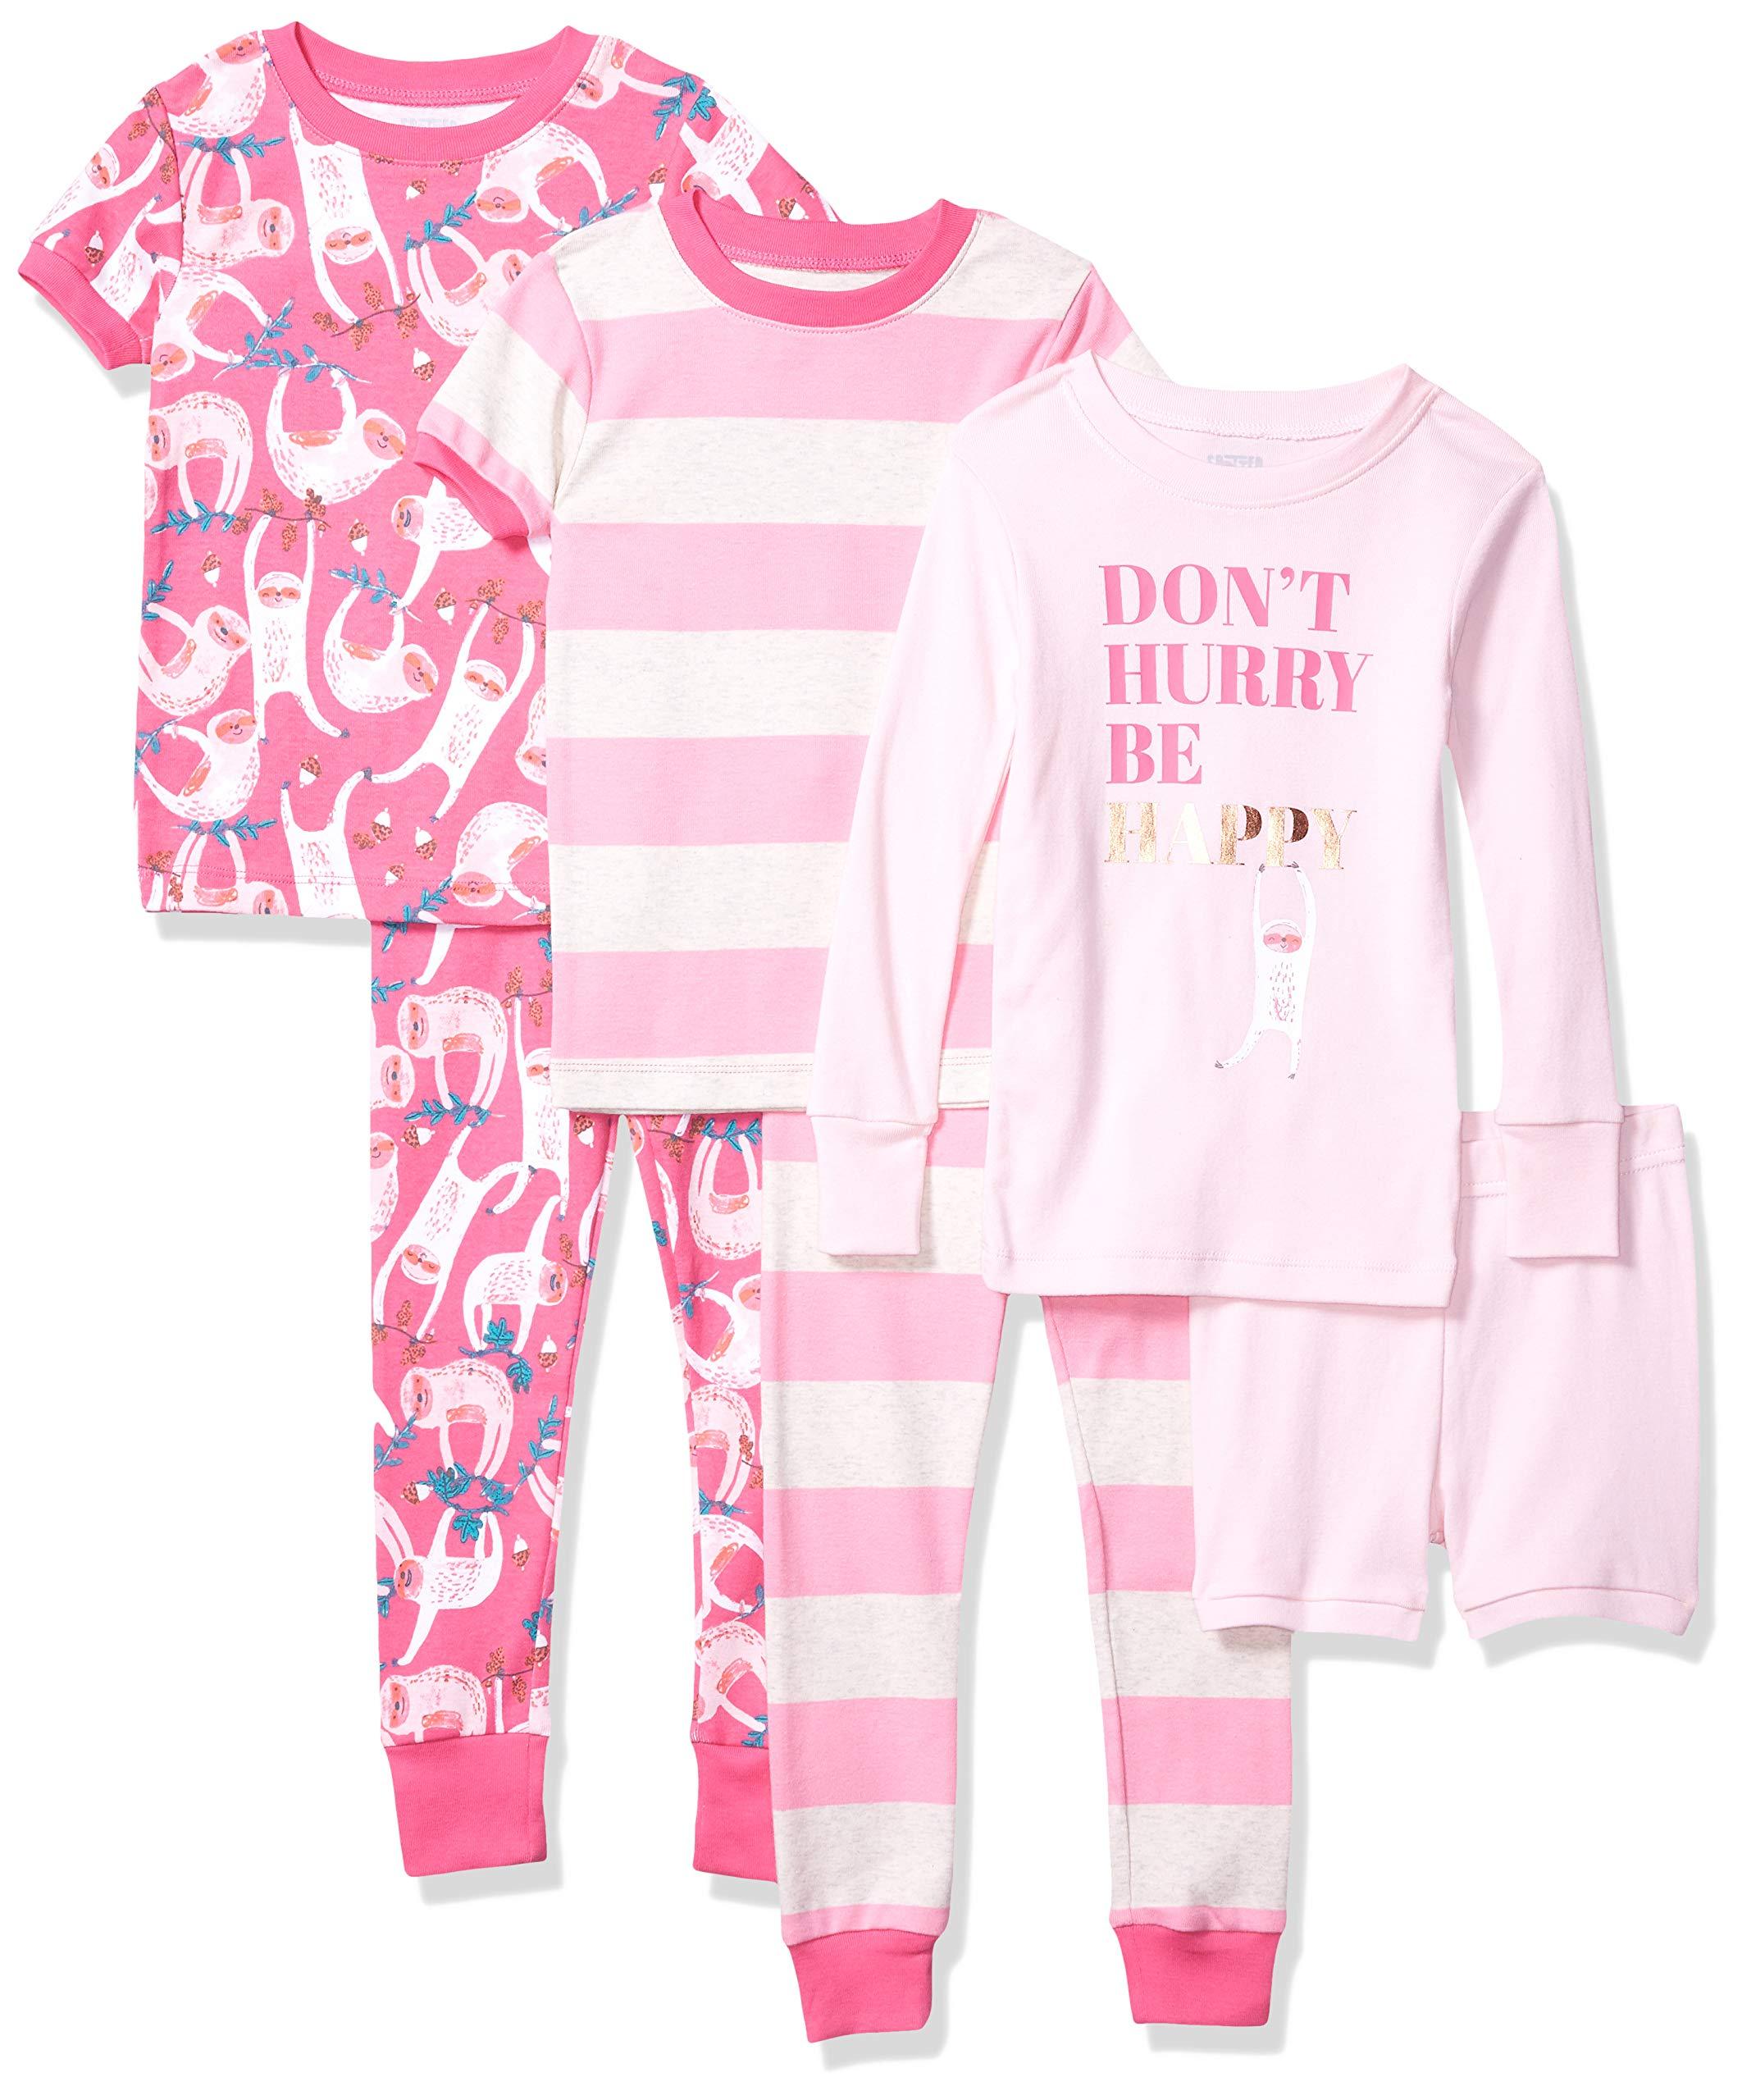 Amazon Brand – Spotted Zebra Boys' Snug-Fit Cotton Pajamas Sleepwear Sets